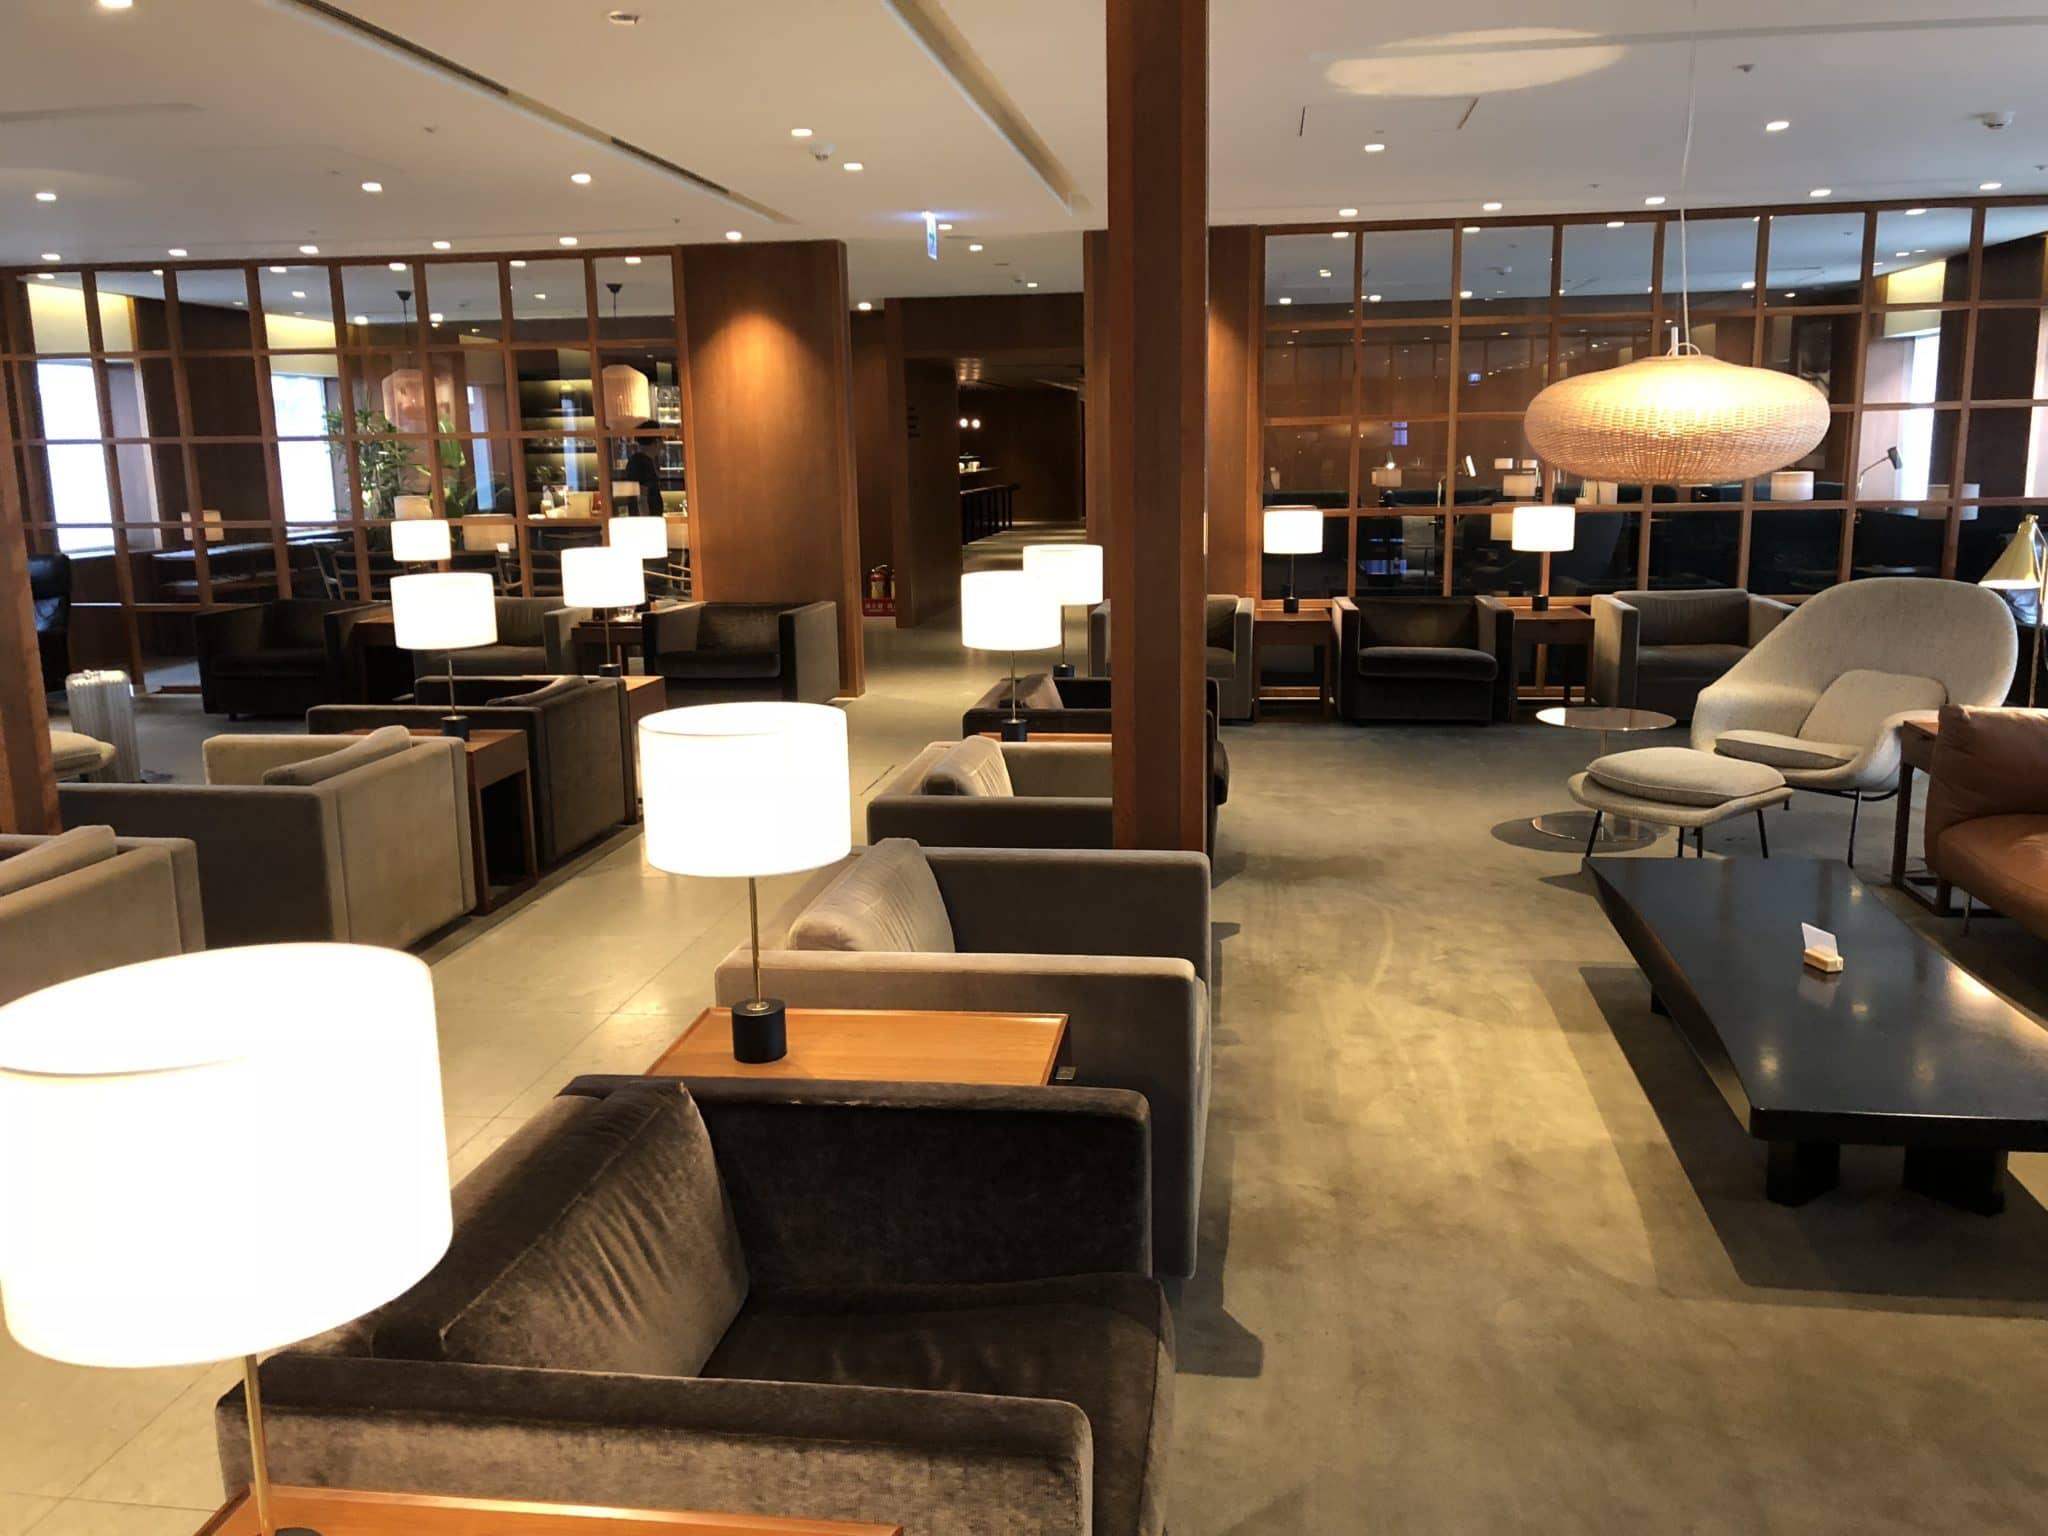 Cathay Pacific Business Class Lounge Taiwan-Taoyuan Hauptbereich Sitzgelegenheiten